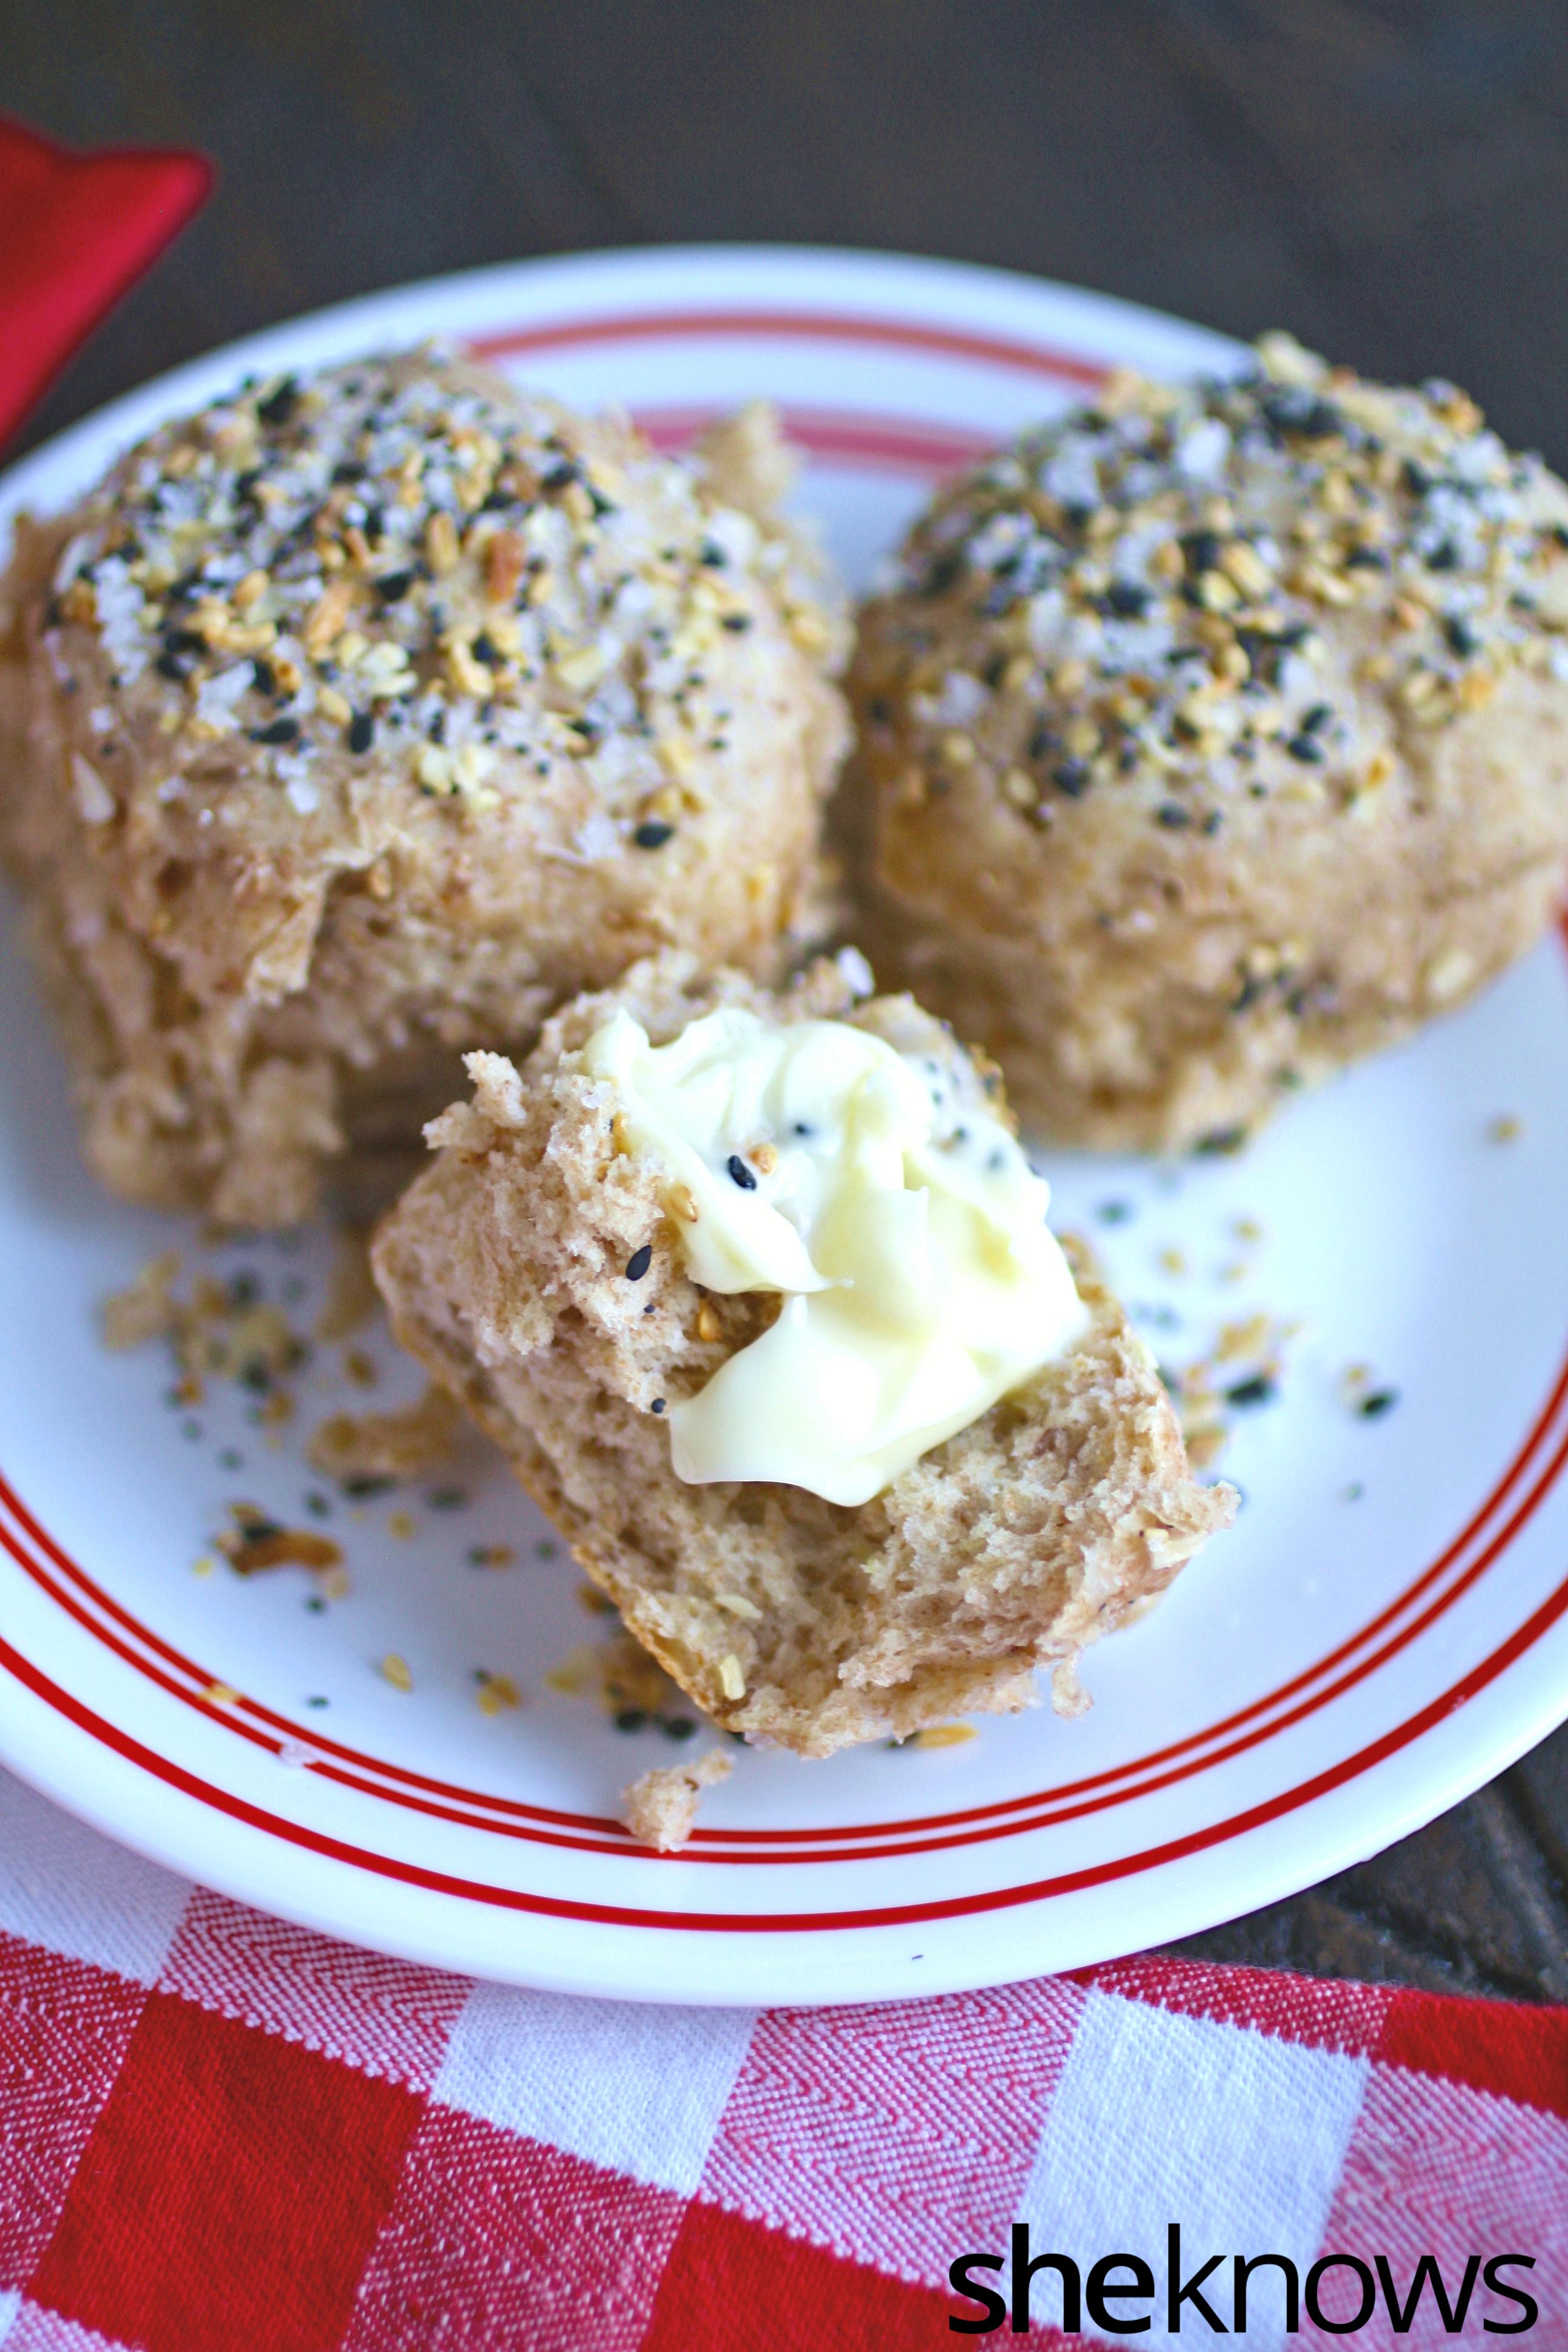 Dinner rolls never tasted better! These easy-to-make everything rolls taste like your favorite bagel, but better